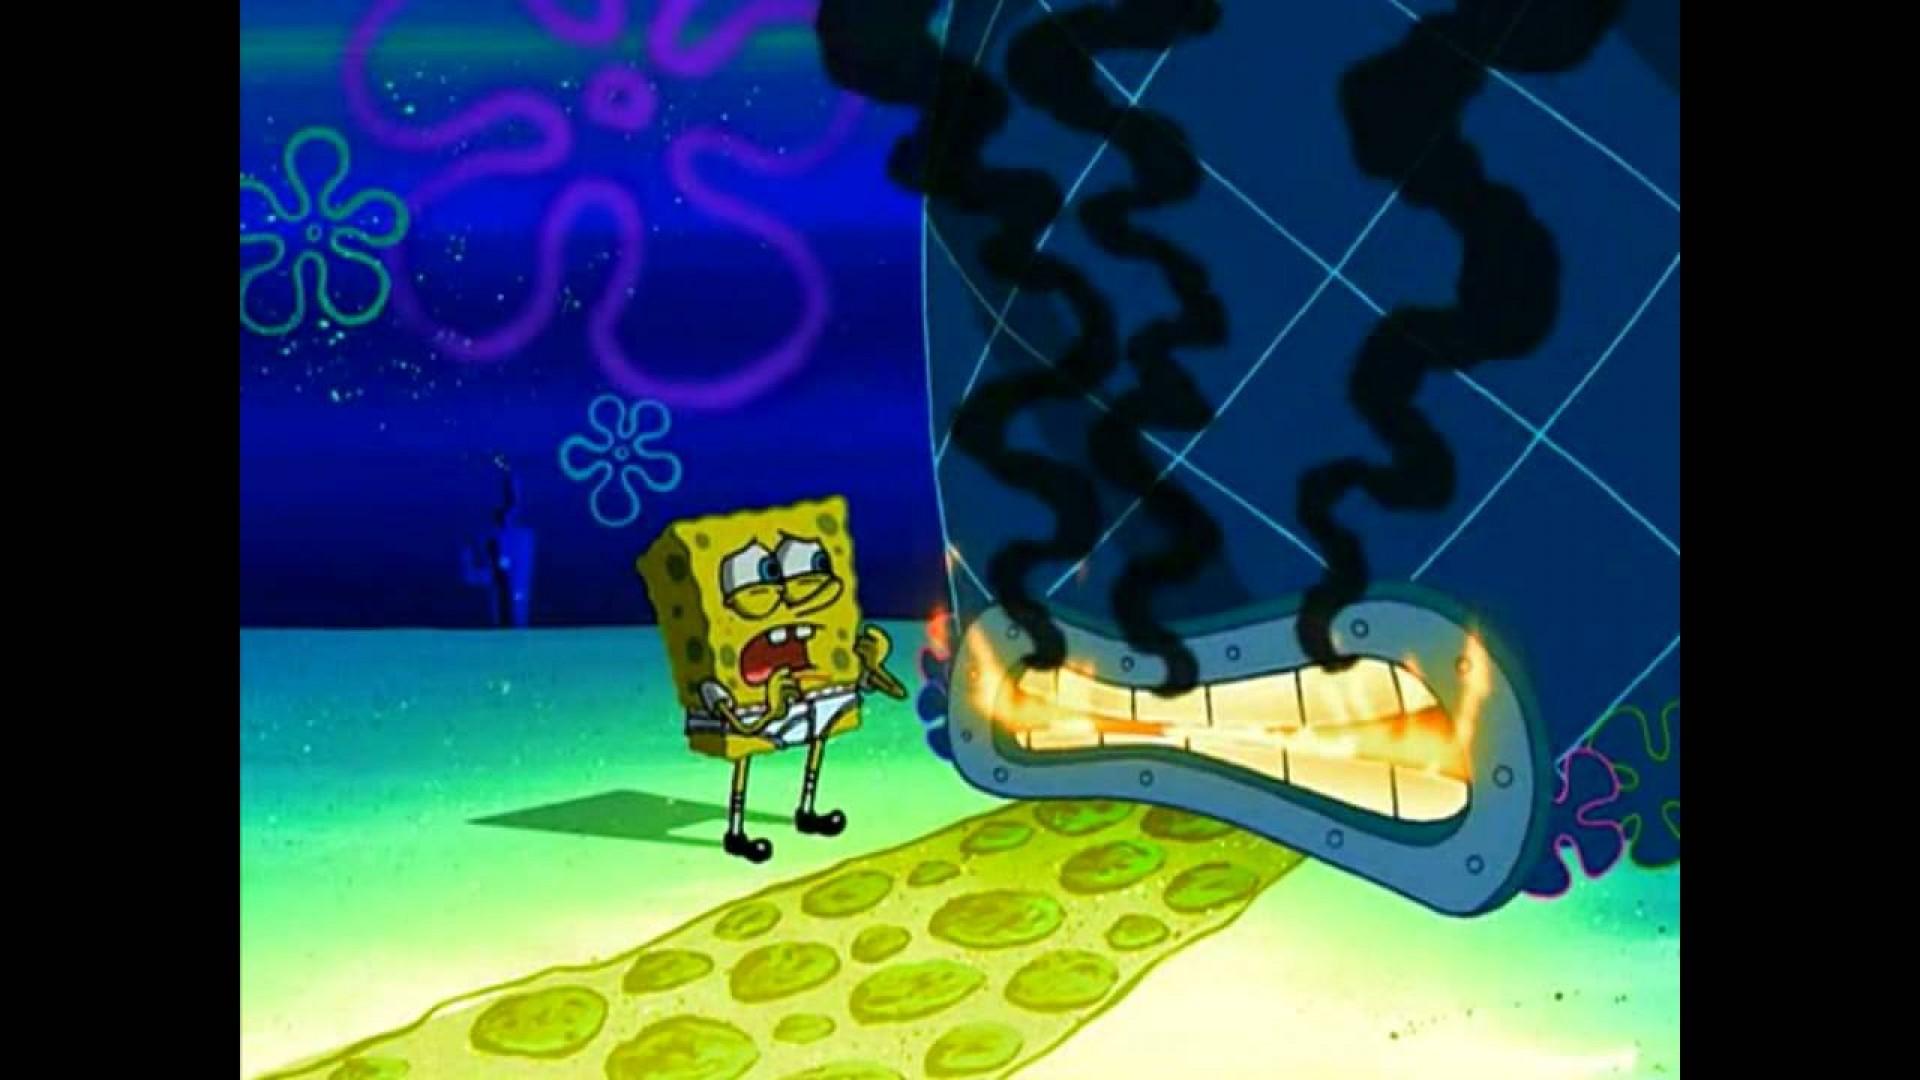 014 Maxresdefault Spongebob Essay Meme Stirring Generator Font 1920